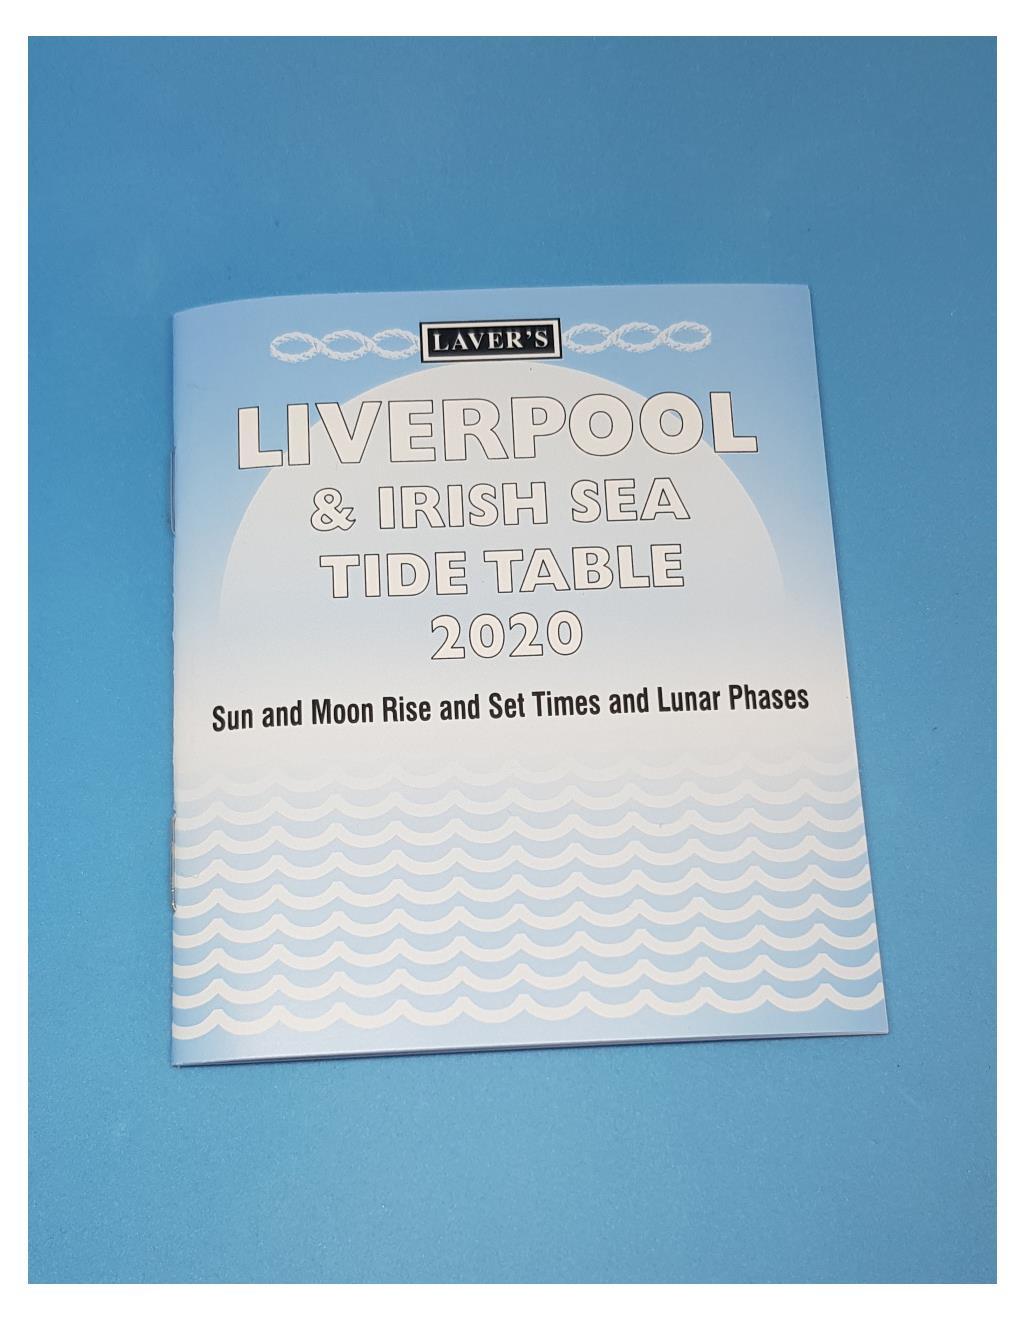 Tide Tables Liverpool and Irish Sea 2020 - Image 1